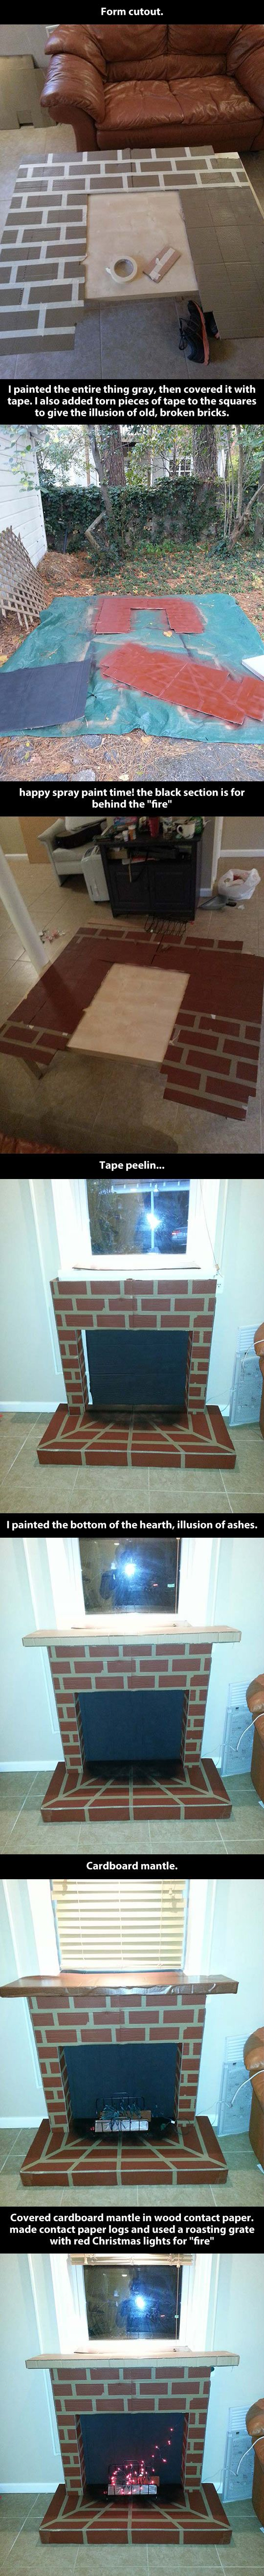 best 25 cardboard fireplace ideas on pinterest apartment